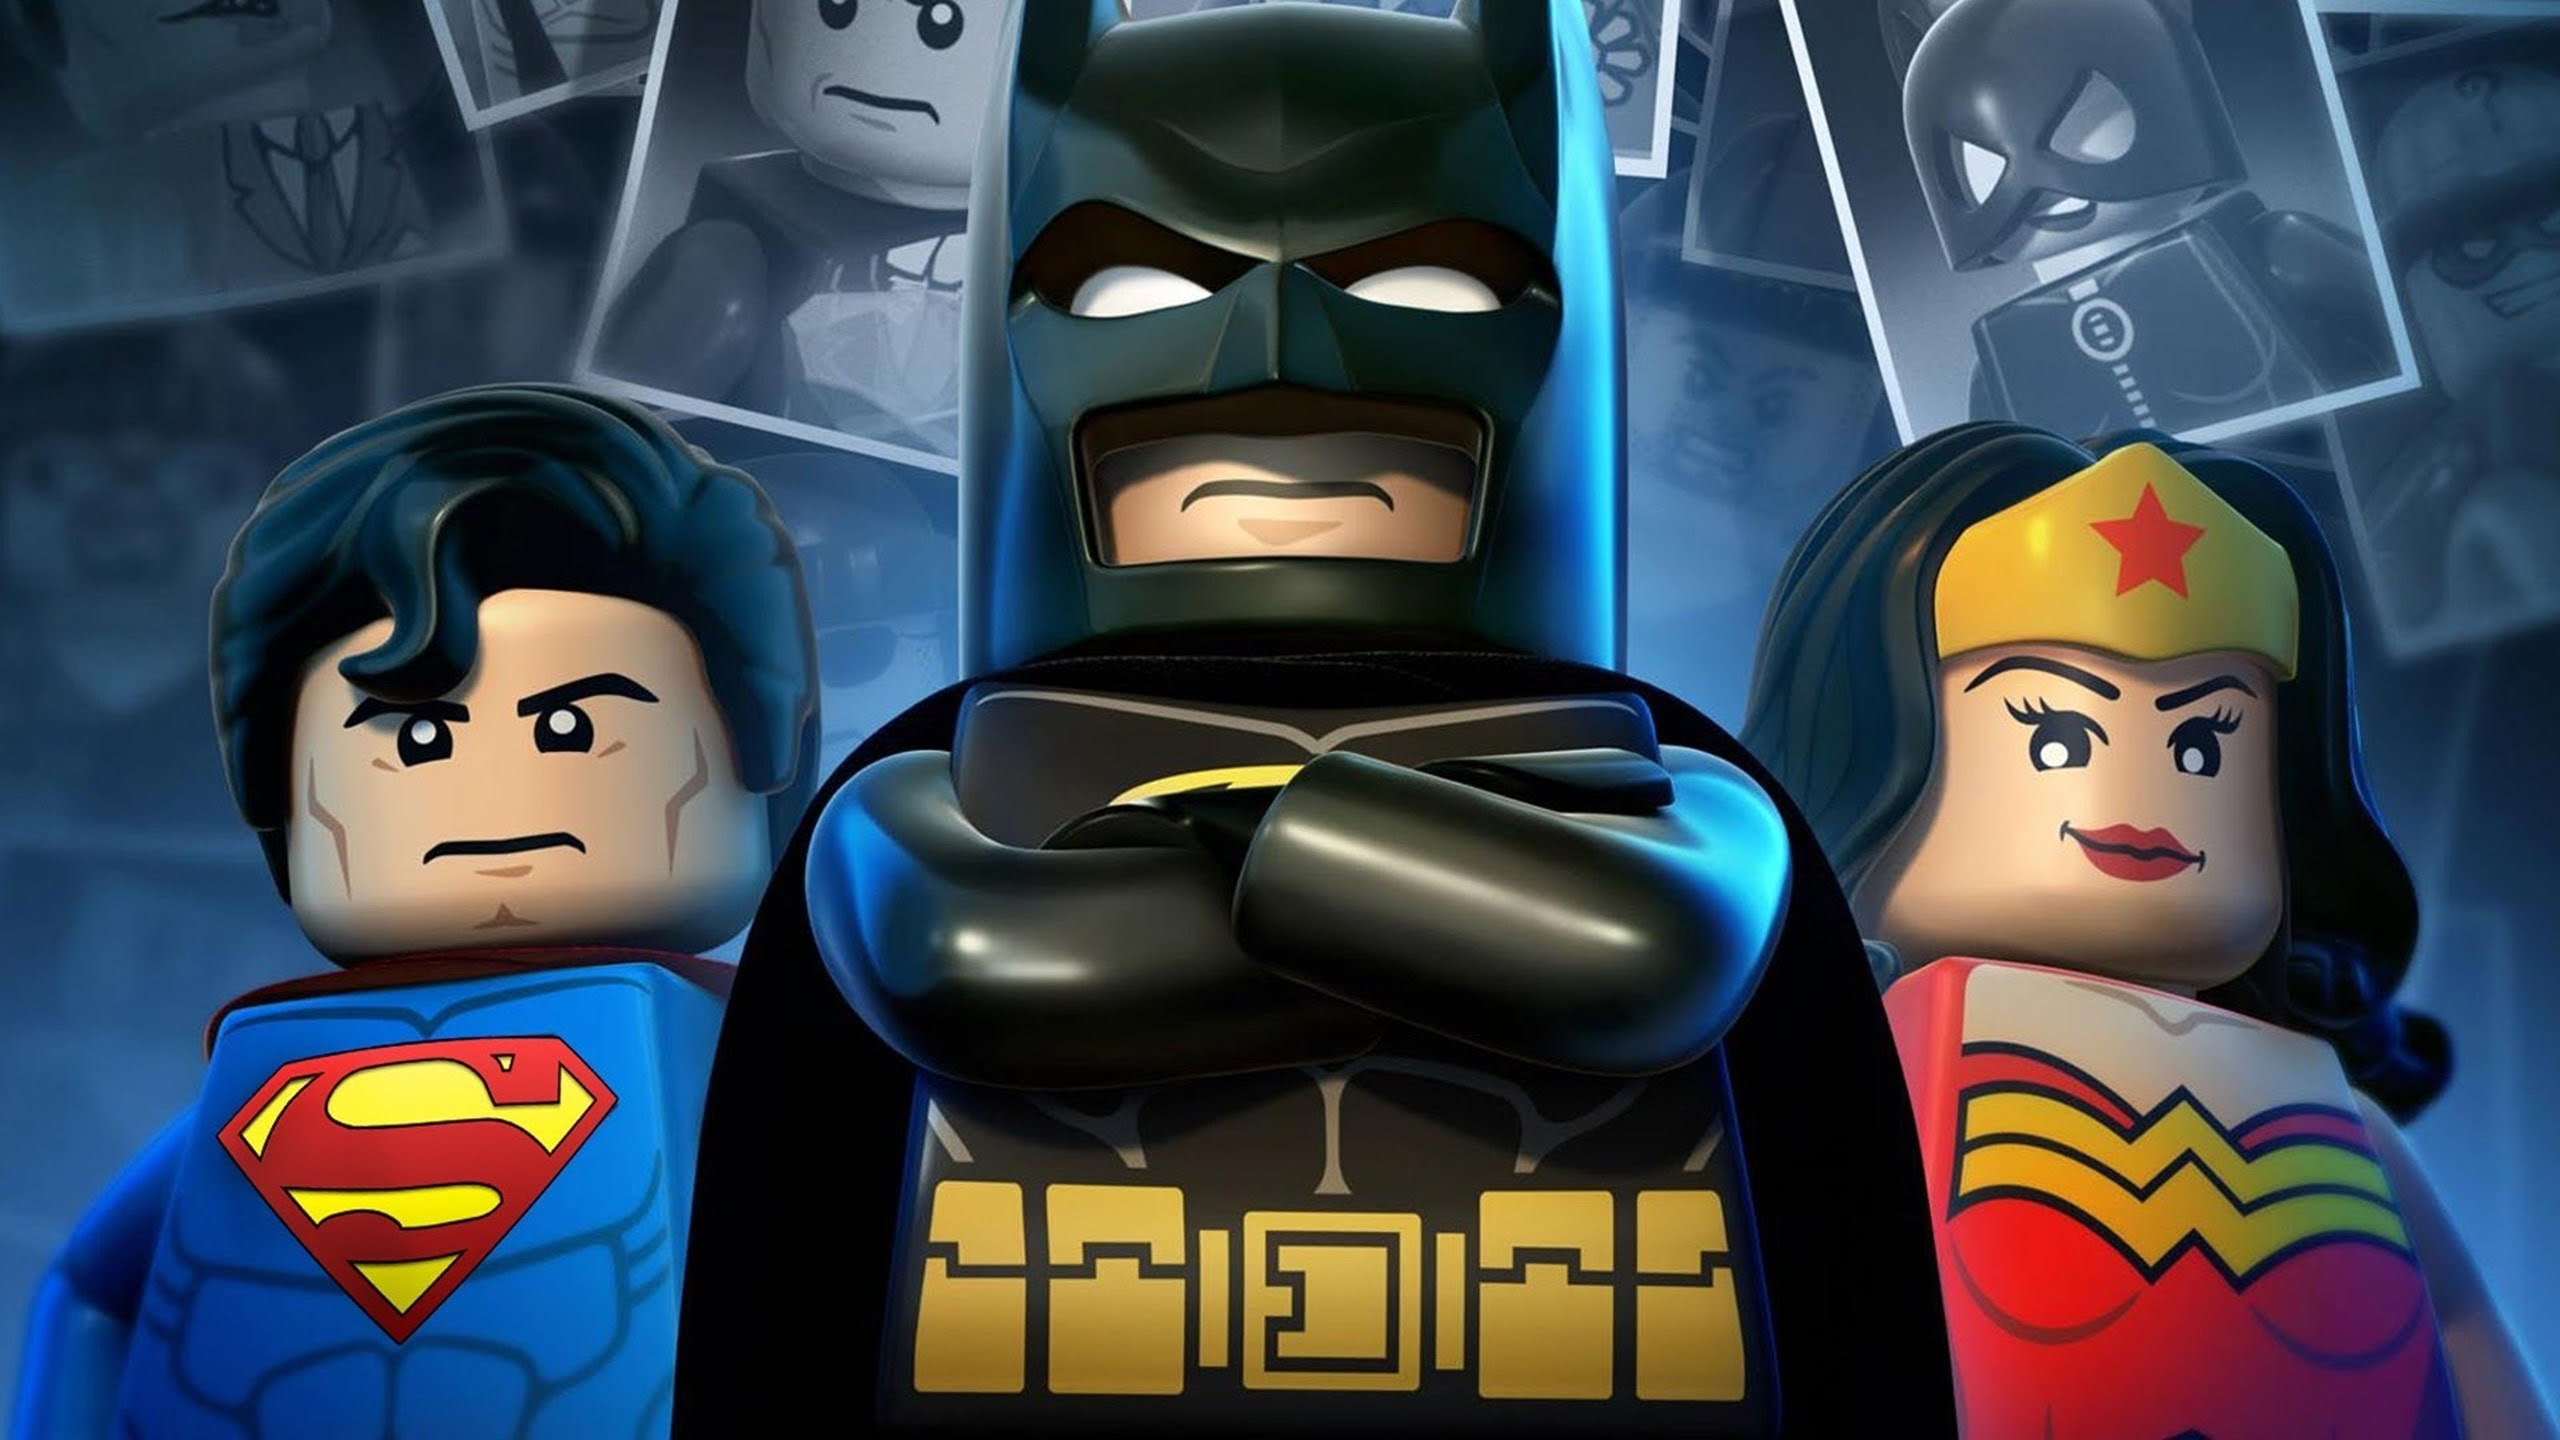 The Lego Movie Desktop wallpaper